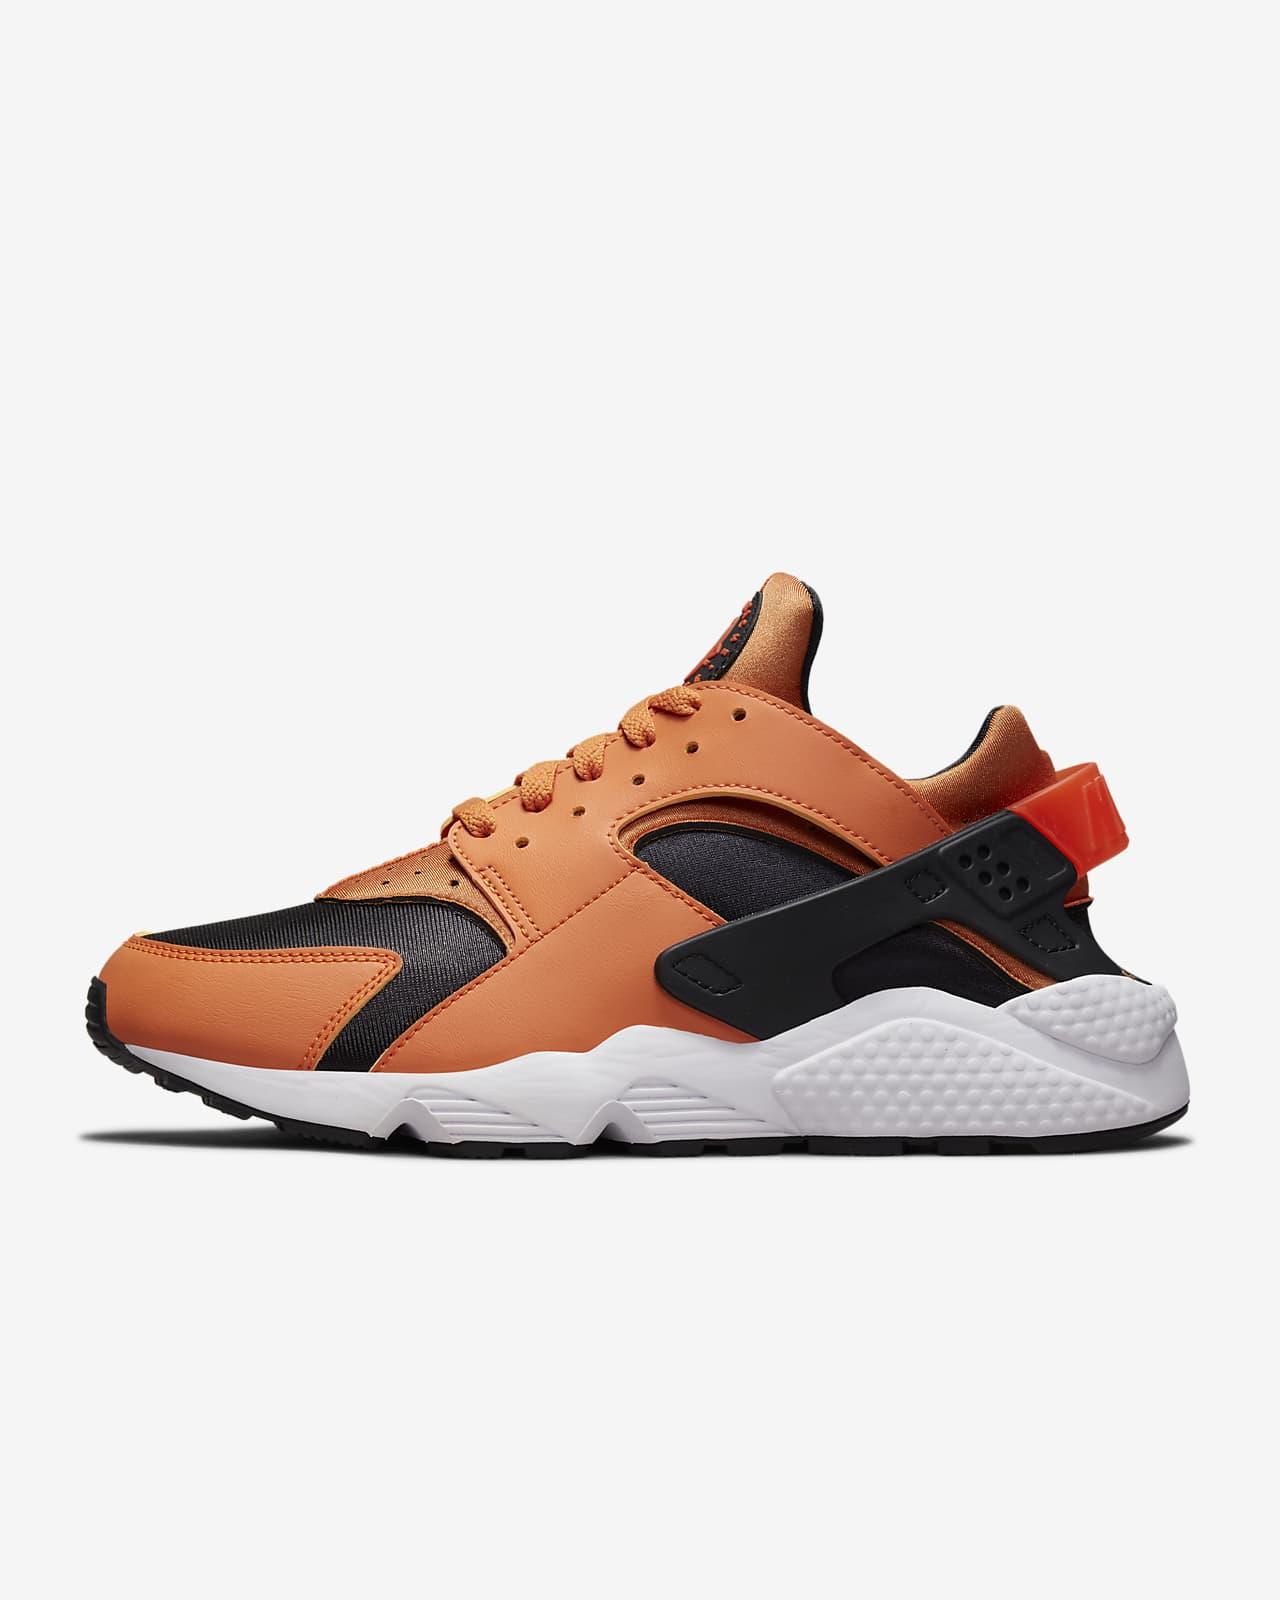 Nike Air Huarache 'Hot Curry / Orange'